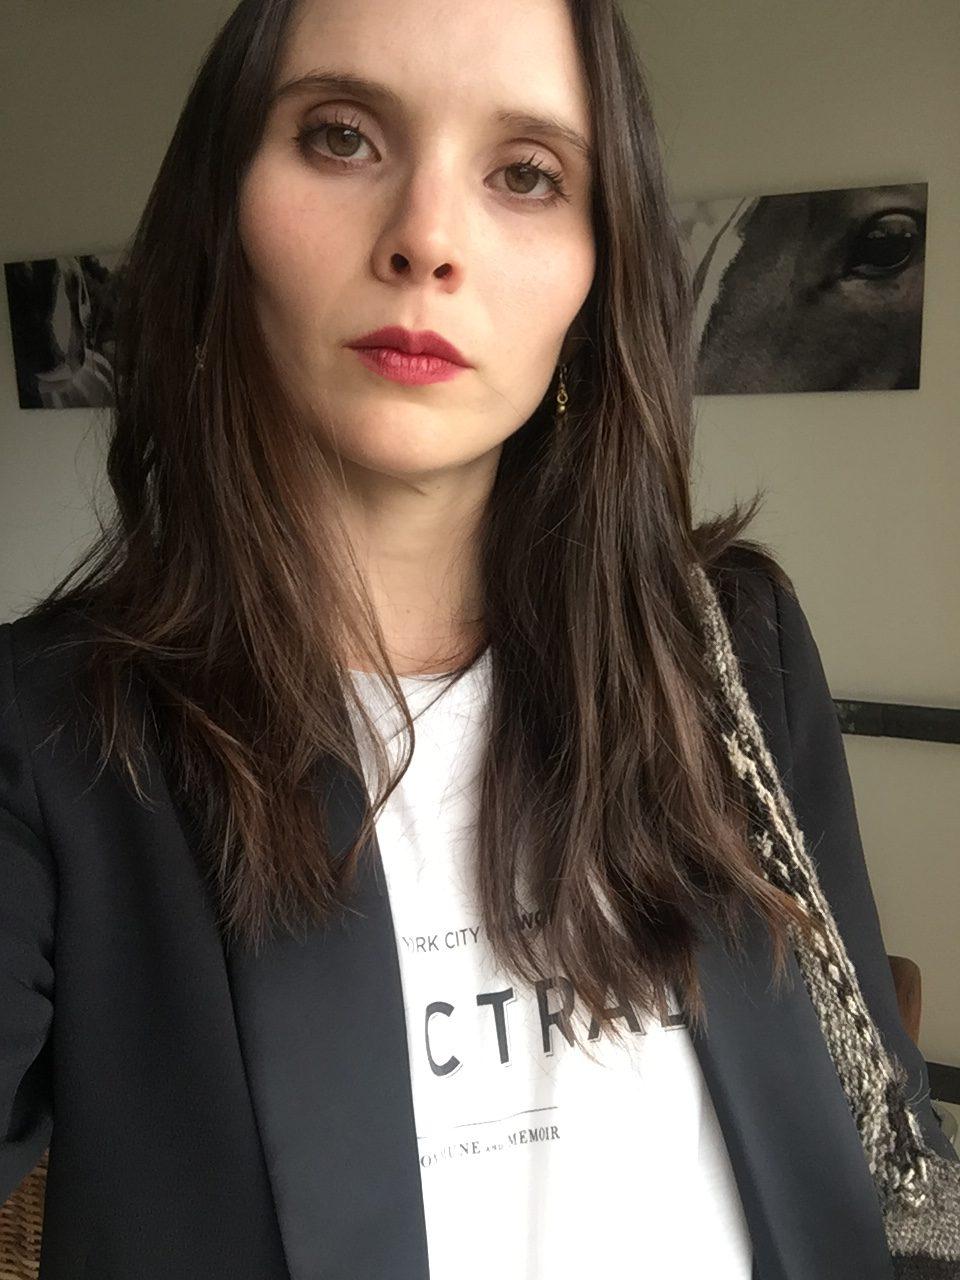 Photo of Laura Beltran-Rubio